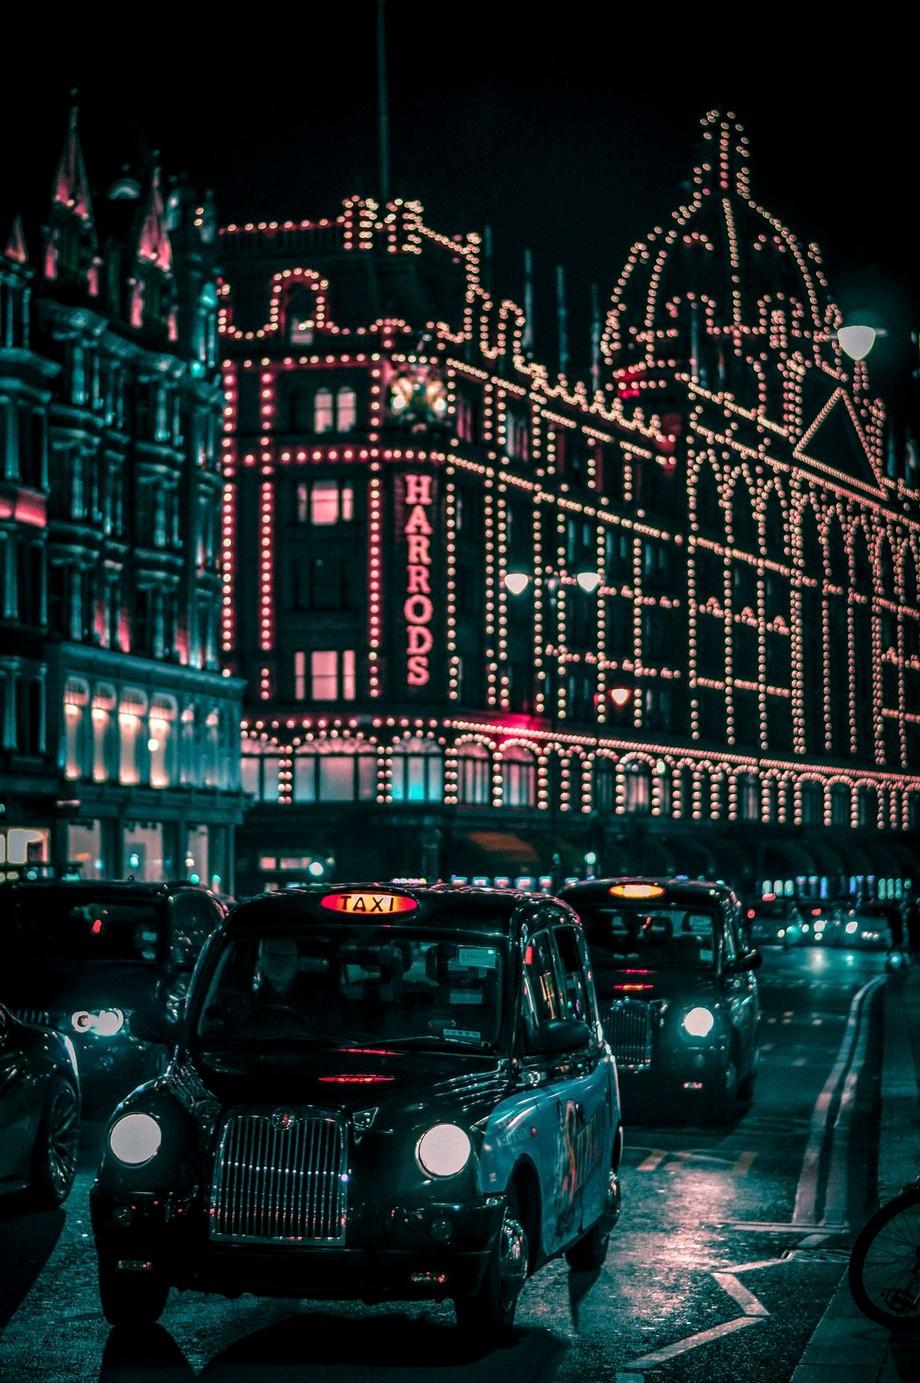 Harrods At Christmas by kierandurrantphotography - Holiday Lights Photo Contest 2017